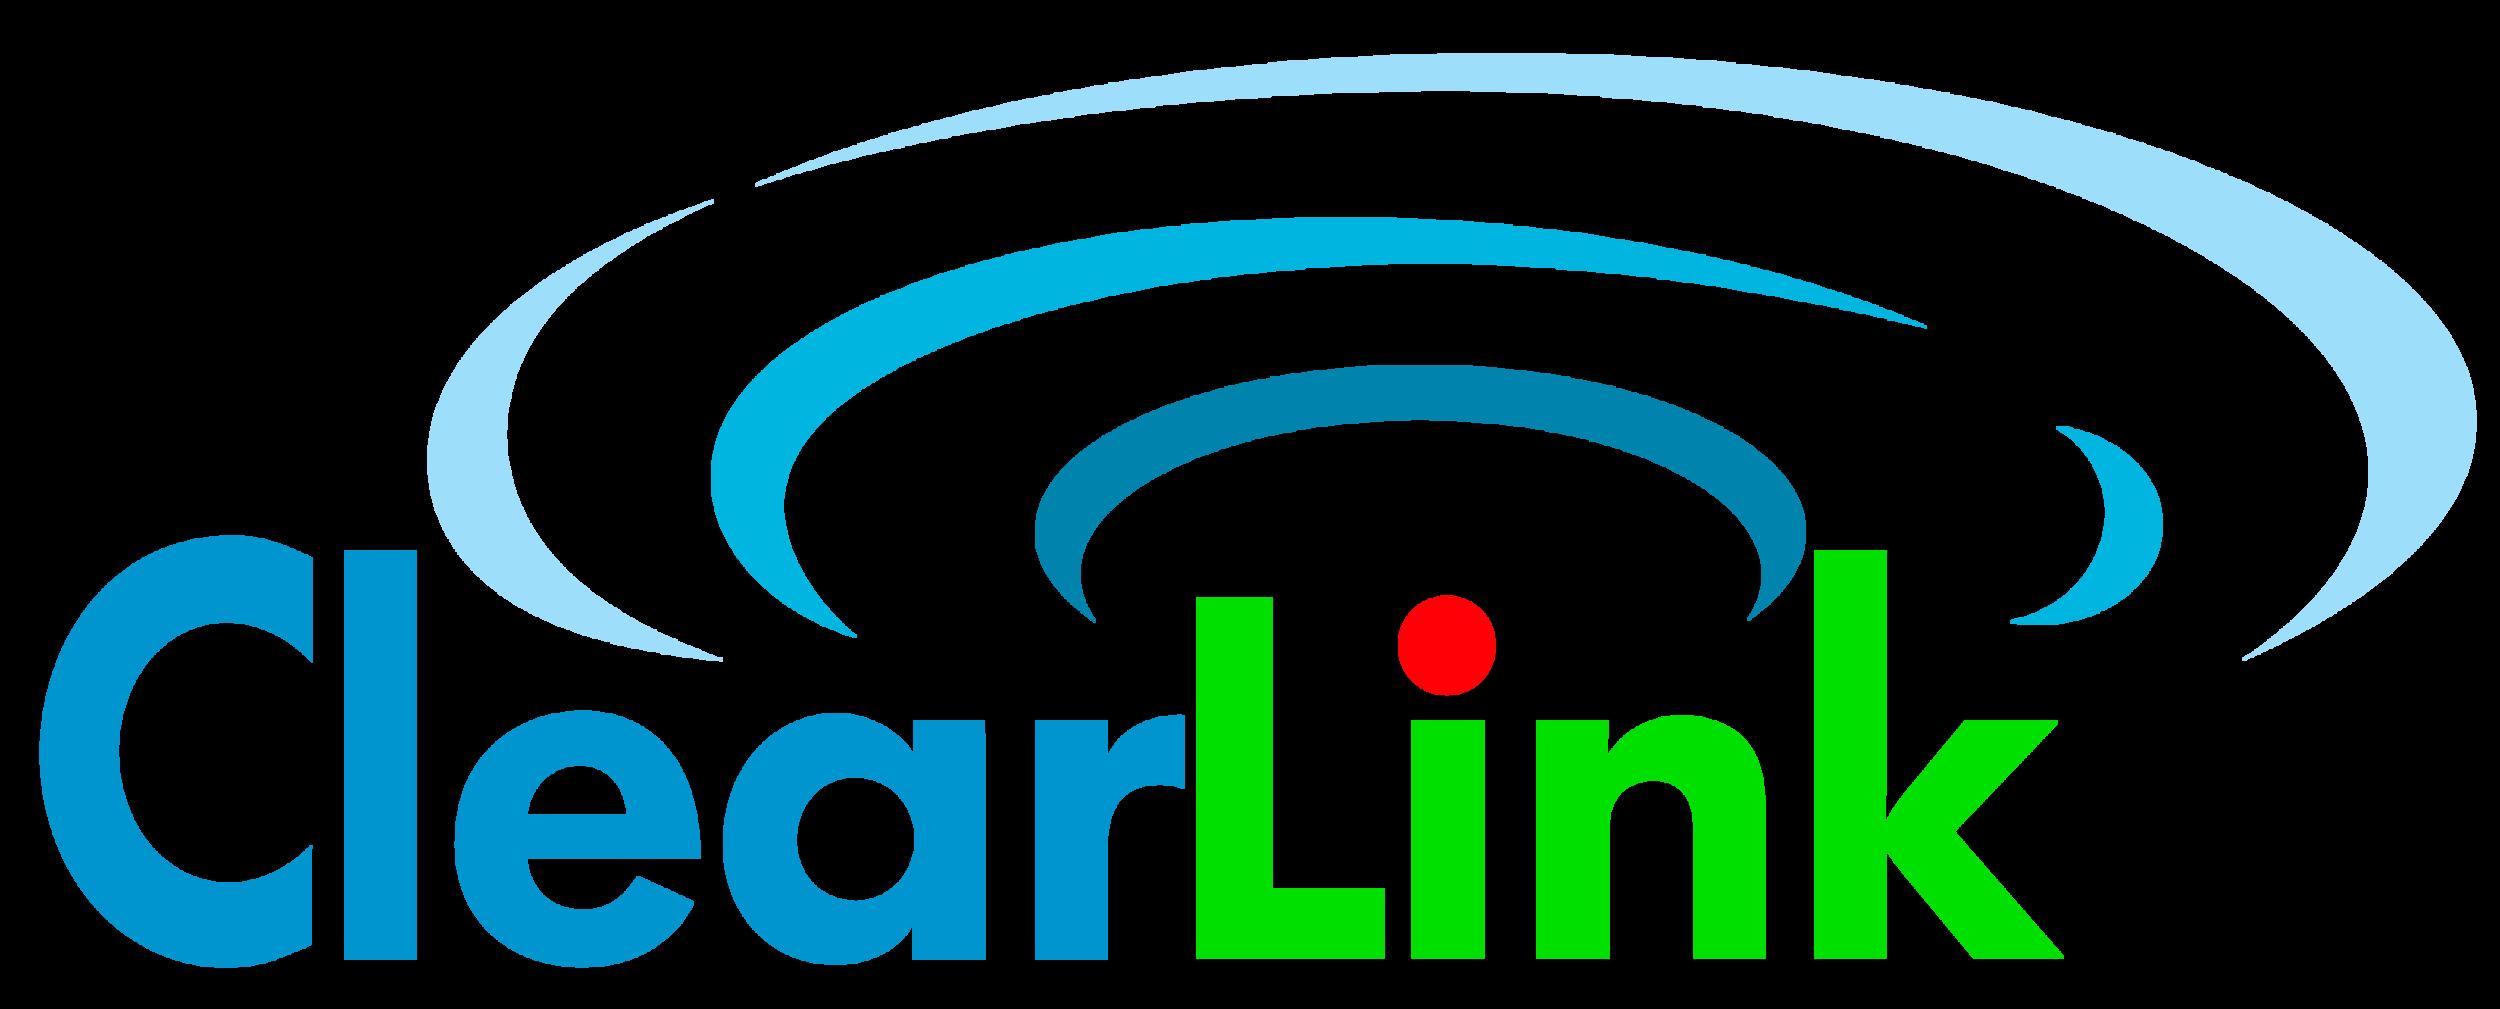 ClearLink Broadband